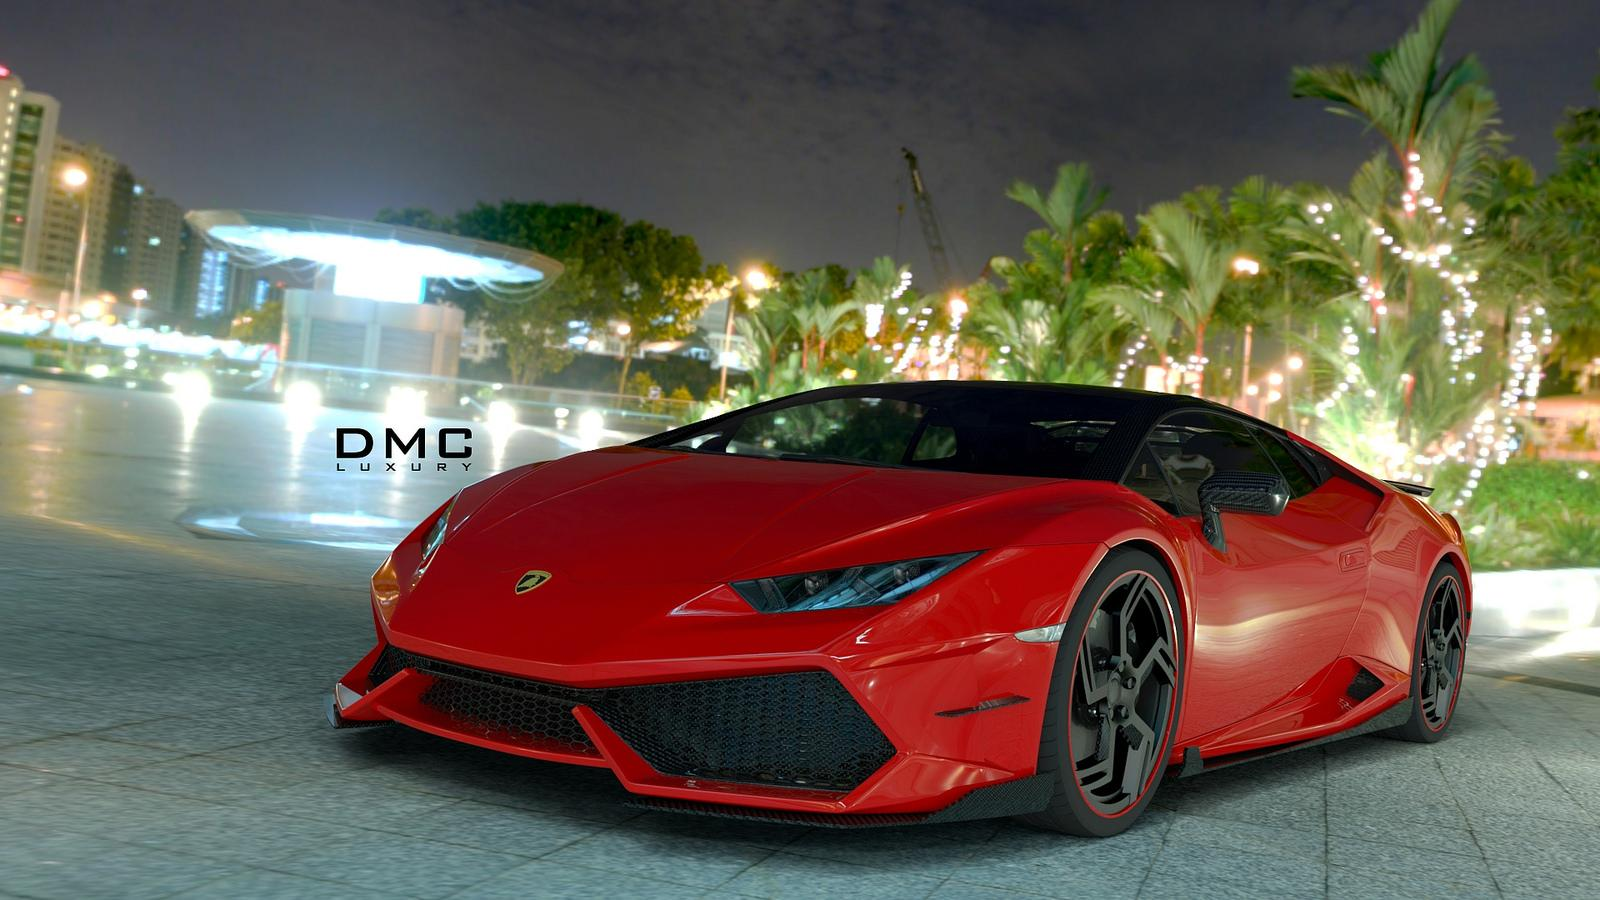 Lamborghini Huracan ชุดแต่งเต็มสูบจาก DMC